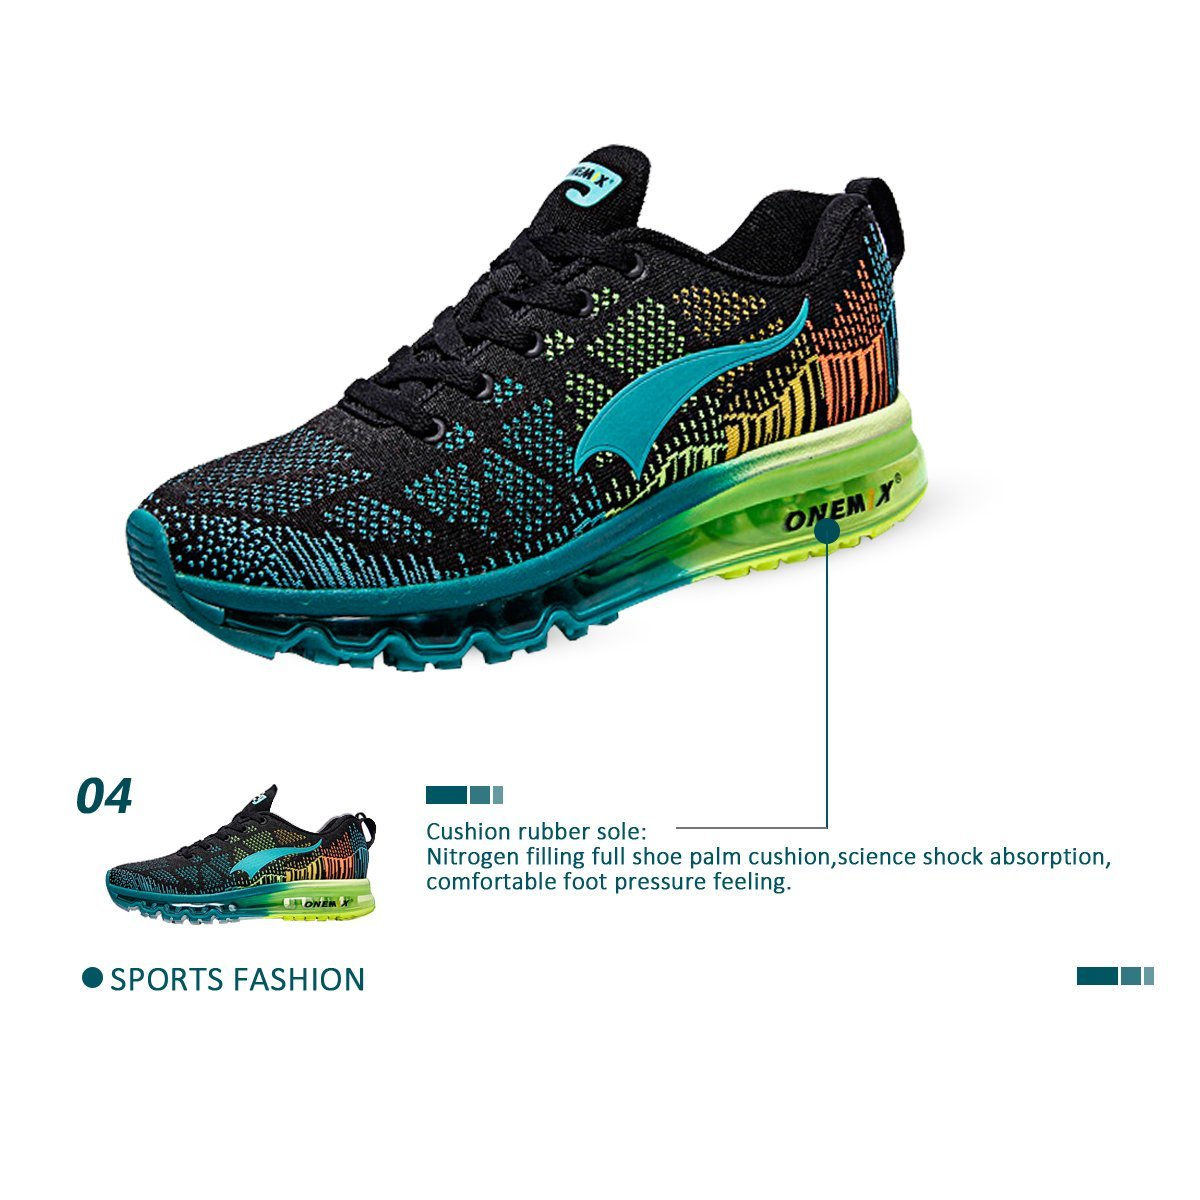 ONEMIX Women's Lightweight Air Cushion B078YJBVXC Outdoor Sport Running Shoes B078YJBVXC Cushion Womens 11(M)US/Men 9.5(M)US 43 EU|Blackblue 7b93a0